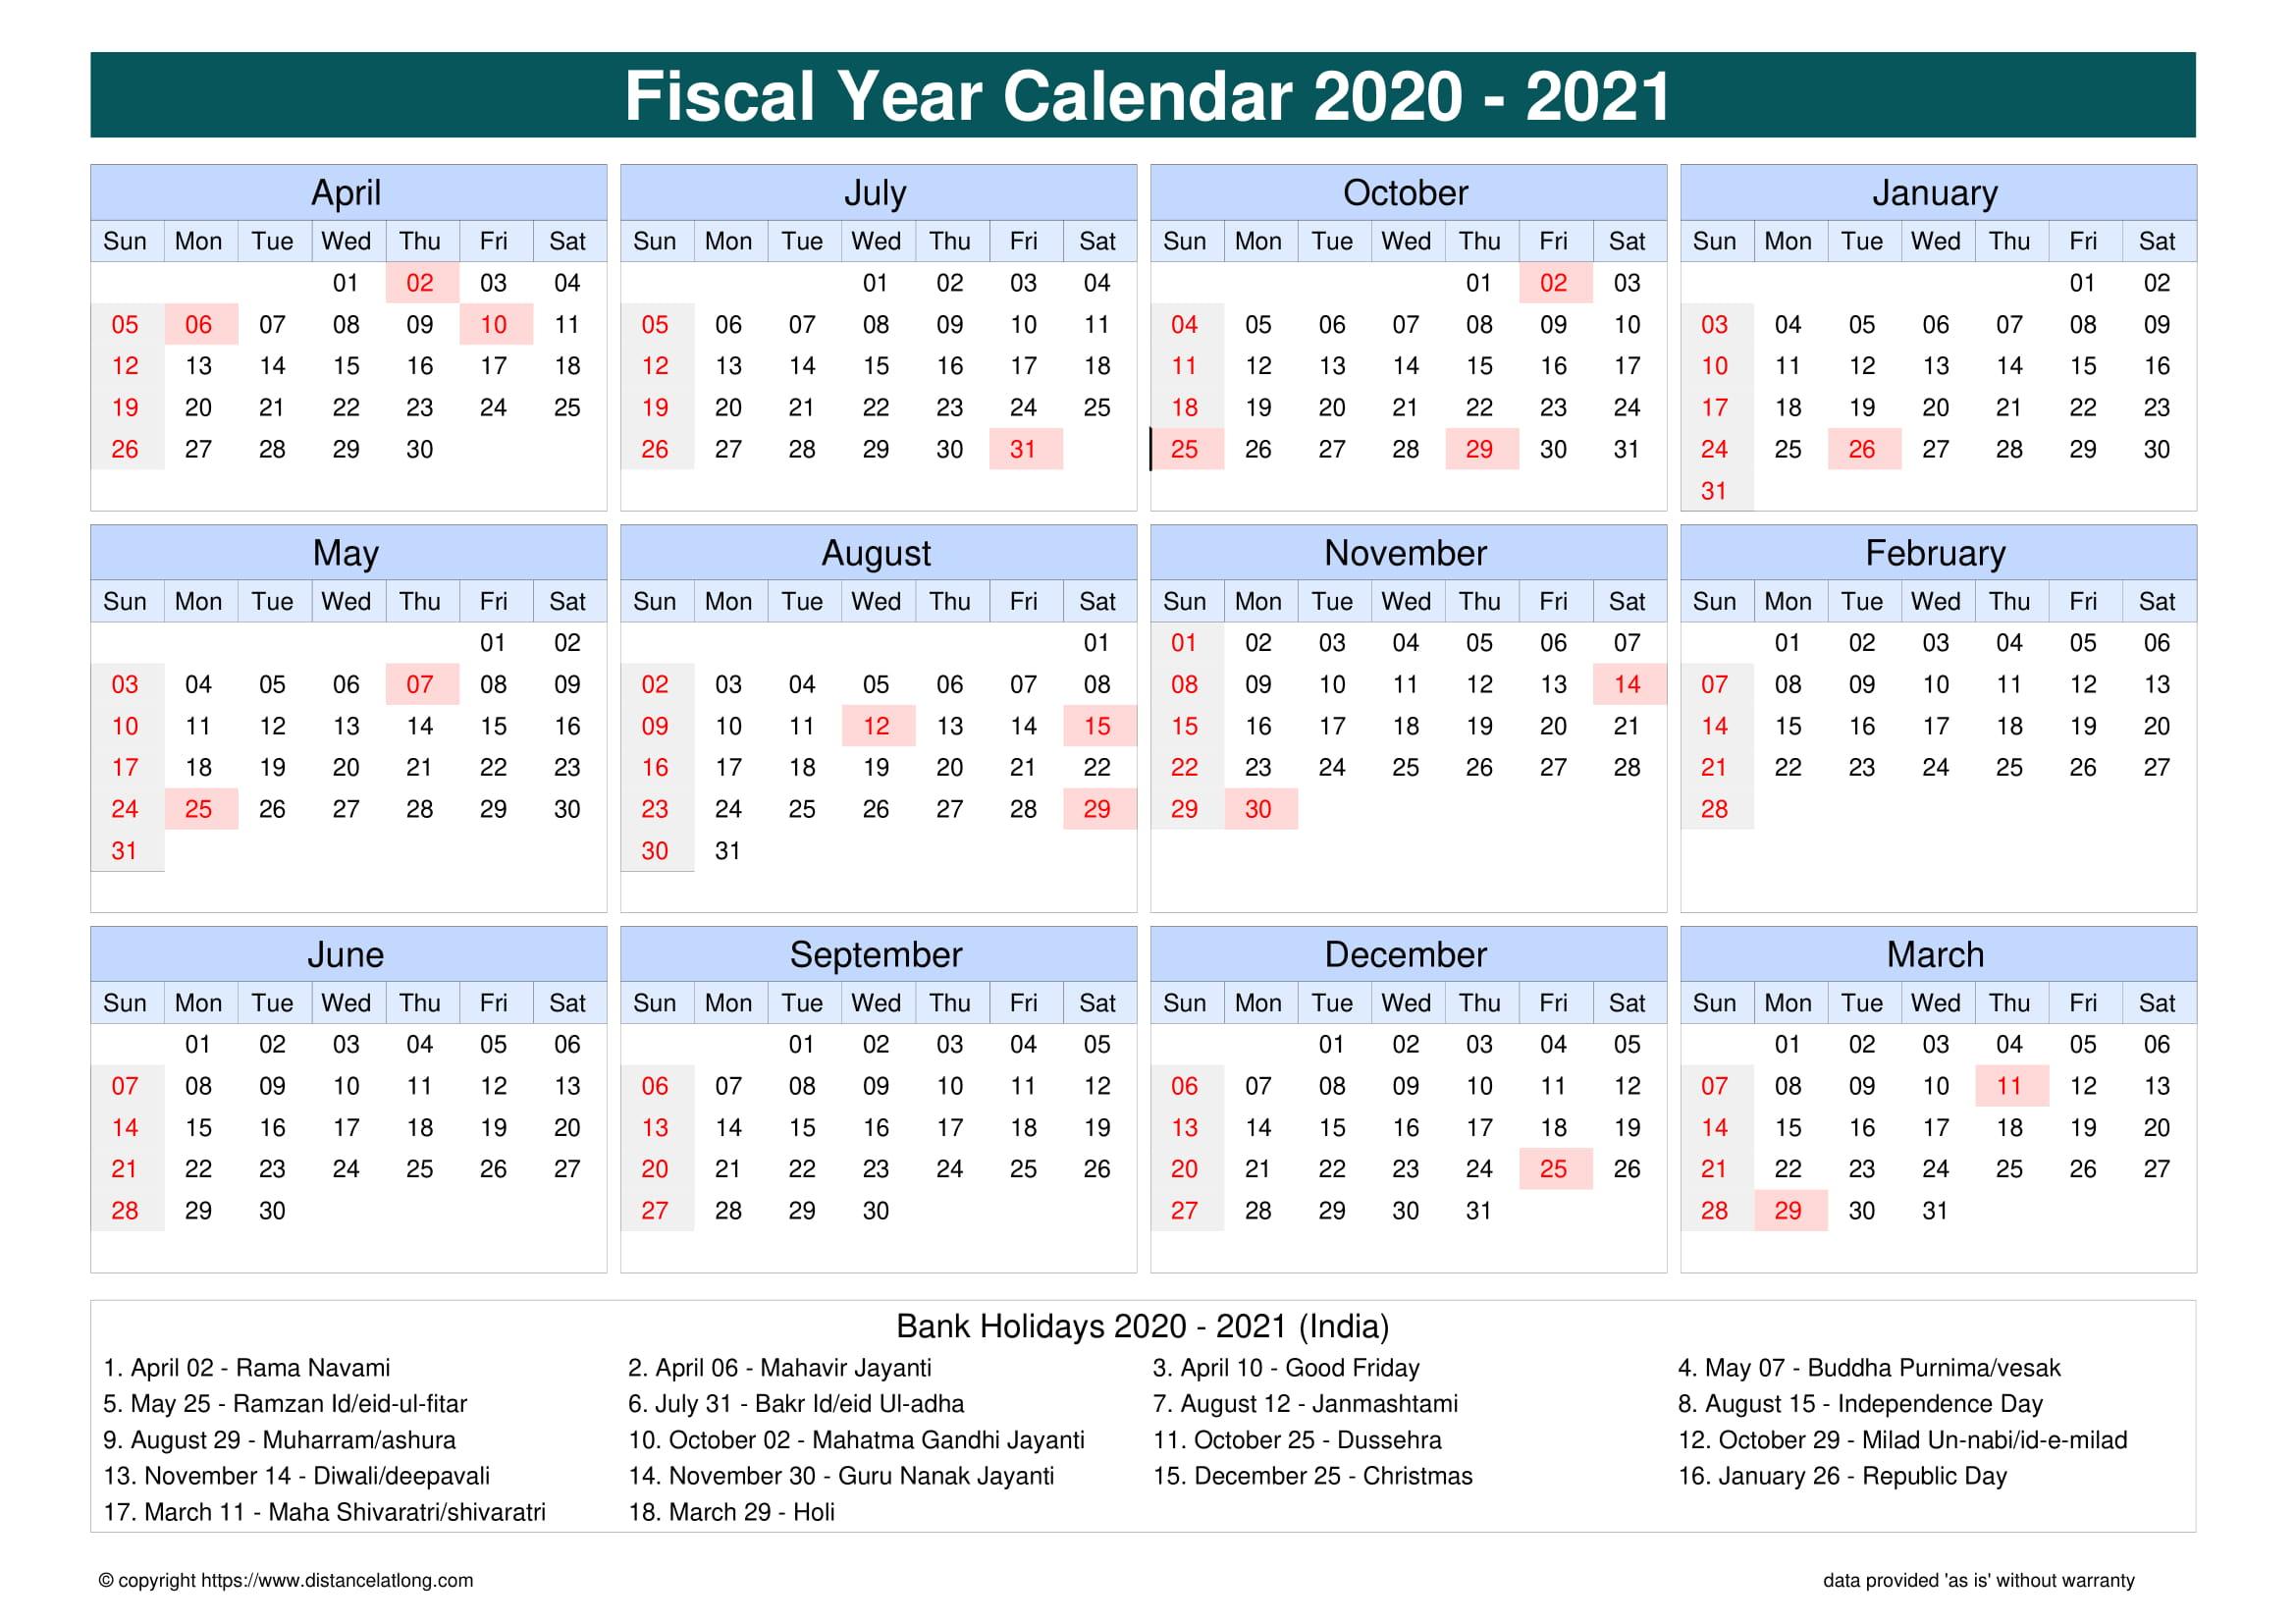 Calendar 2021 Of Stock Market Holidays | 2021 Calendar